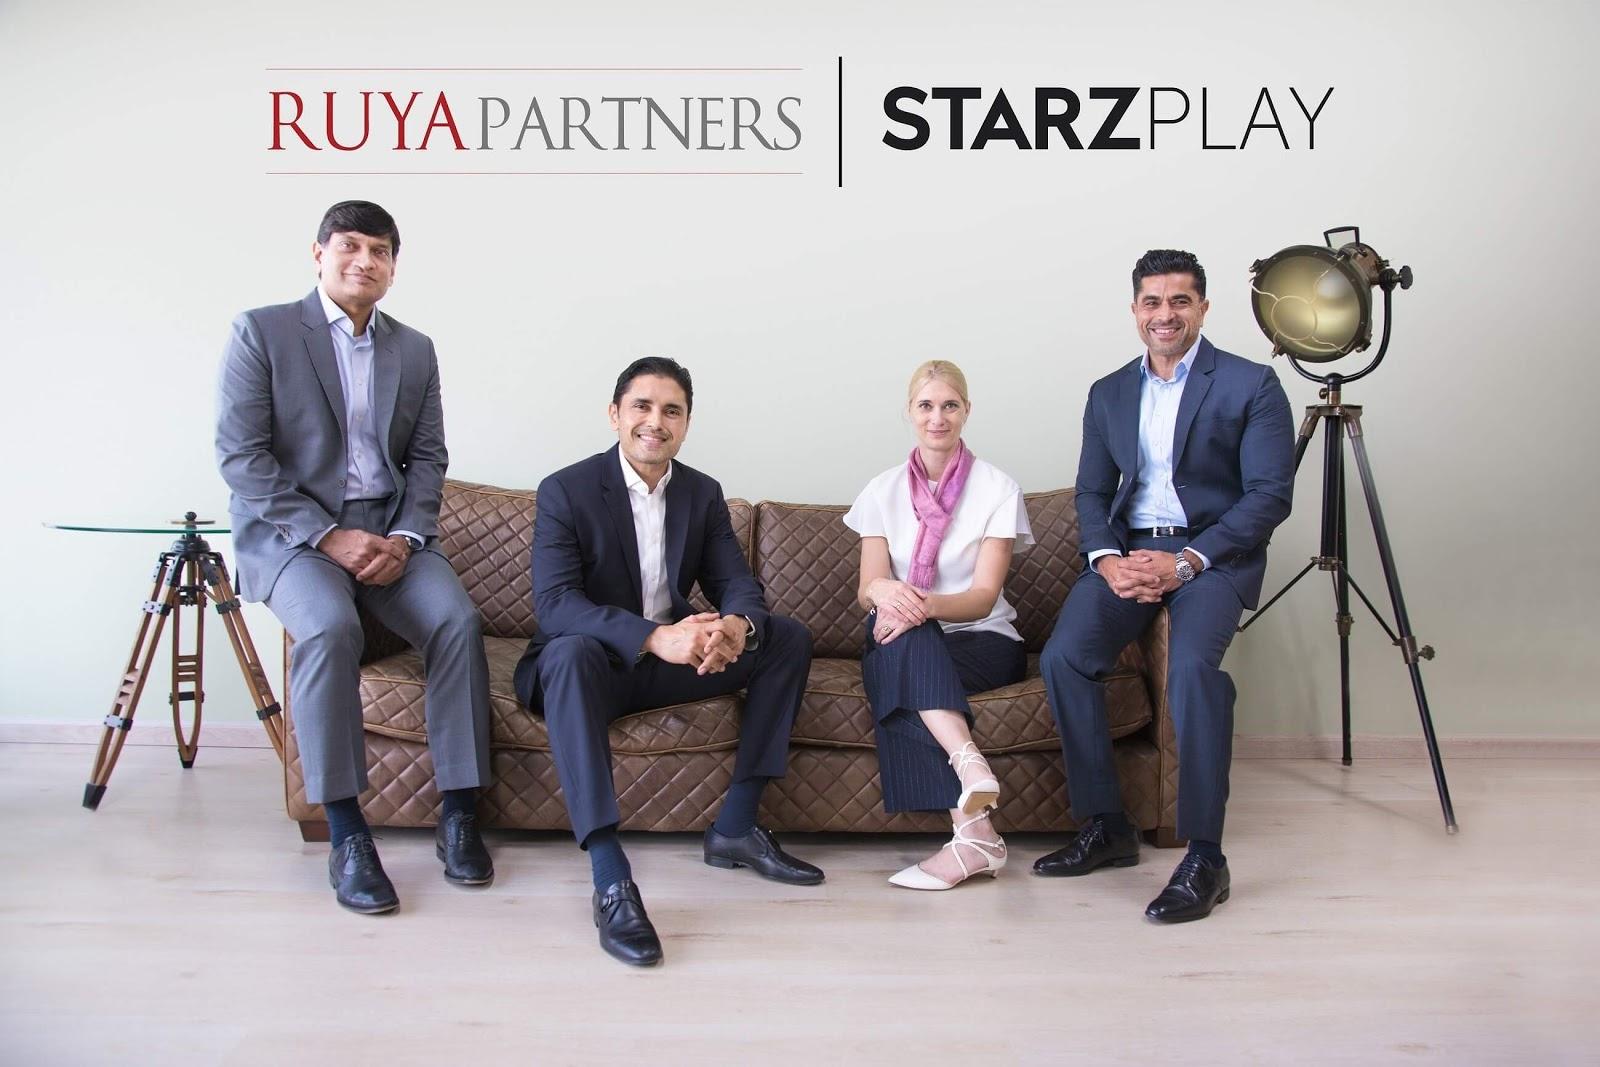 starzplay-first-debt-financing-usd-25-million